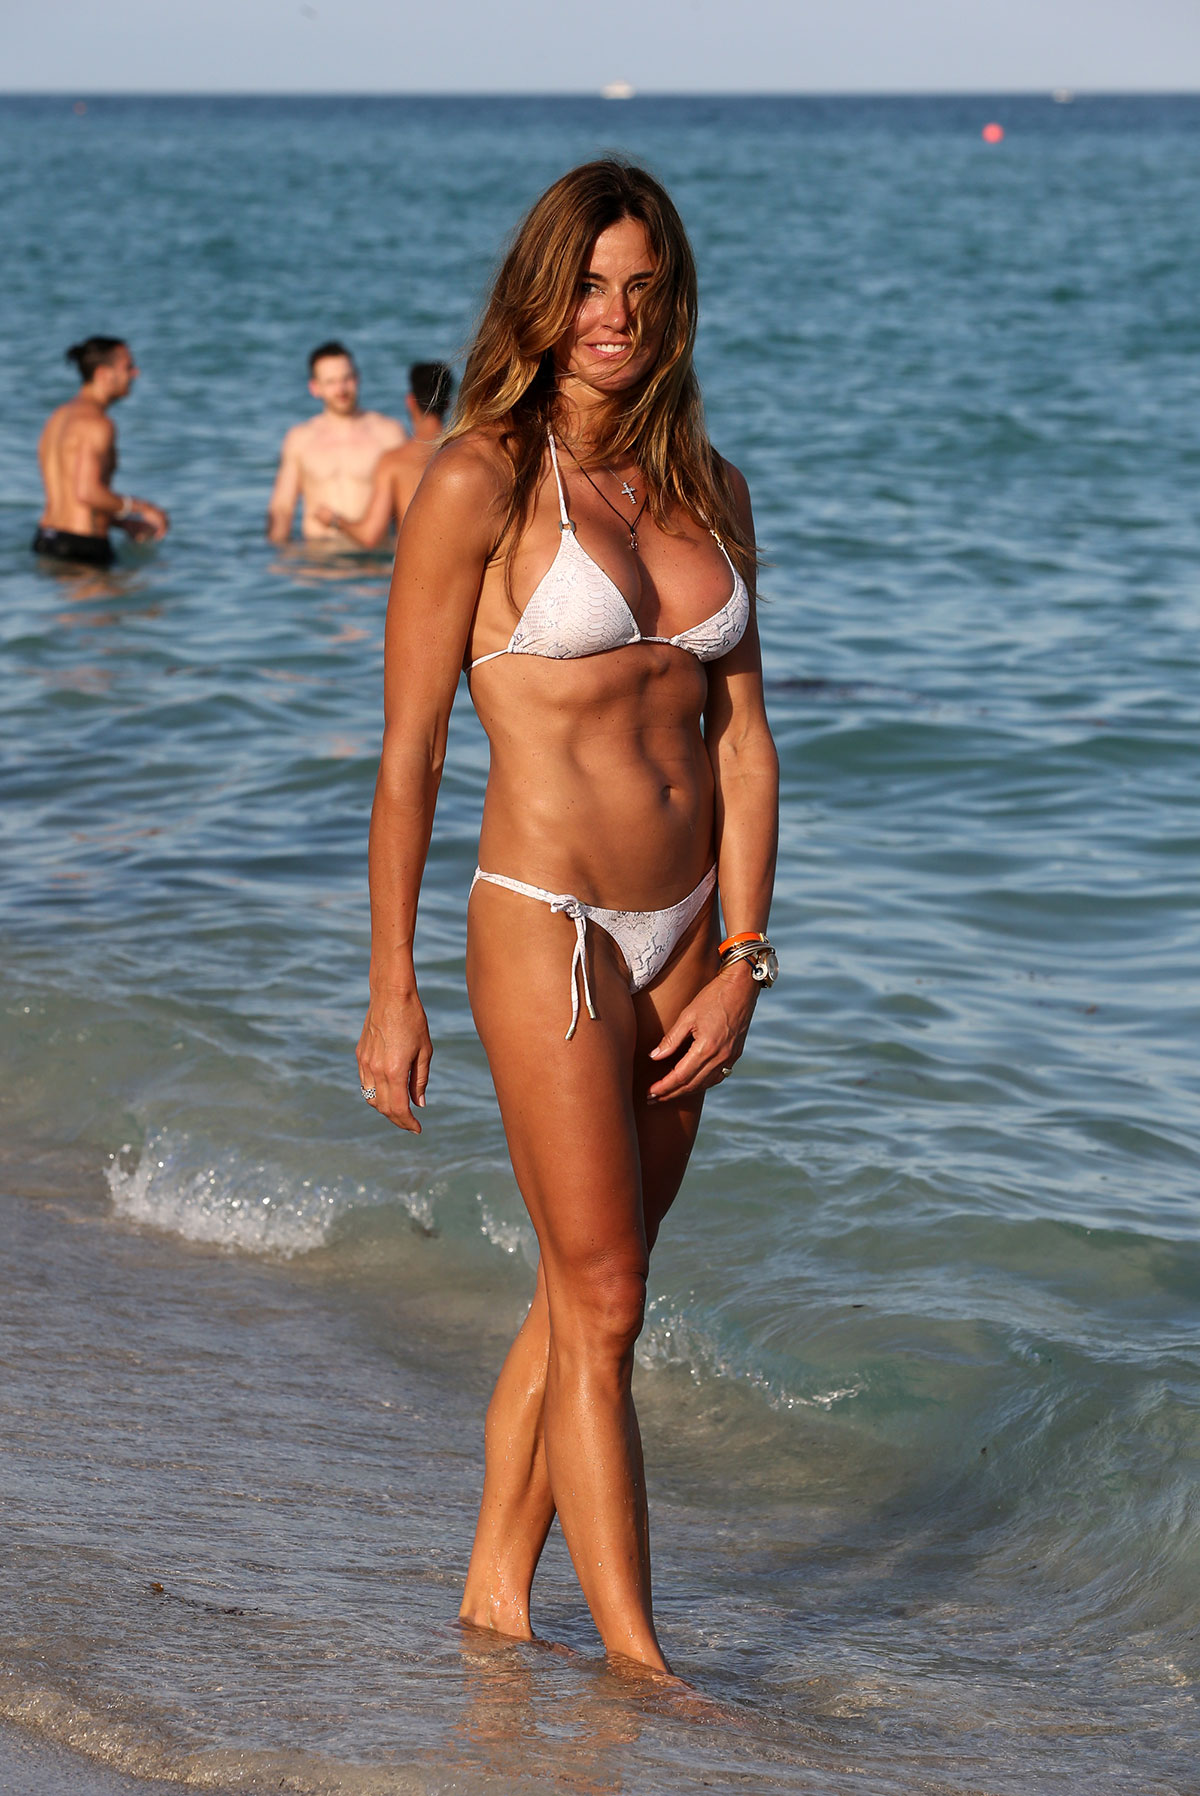 Alison eastwood nude Nude Photos